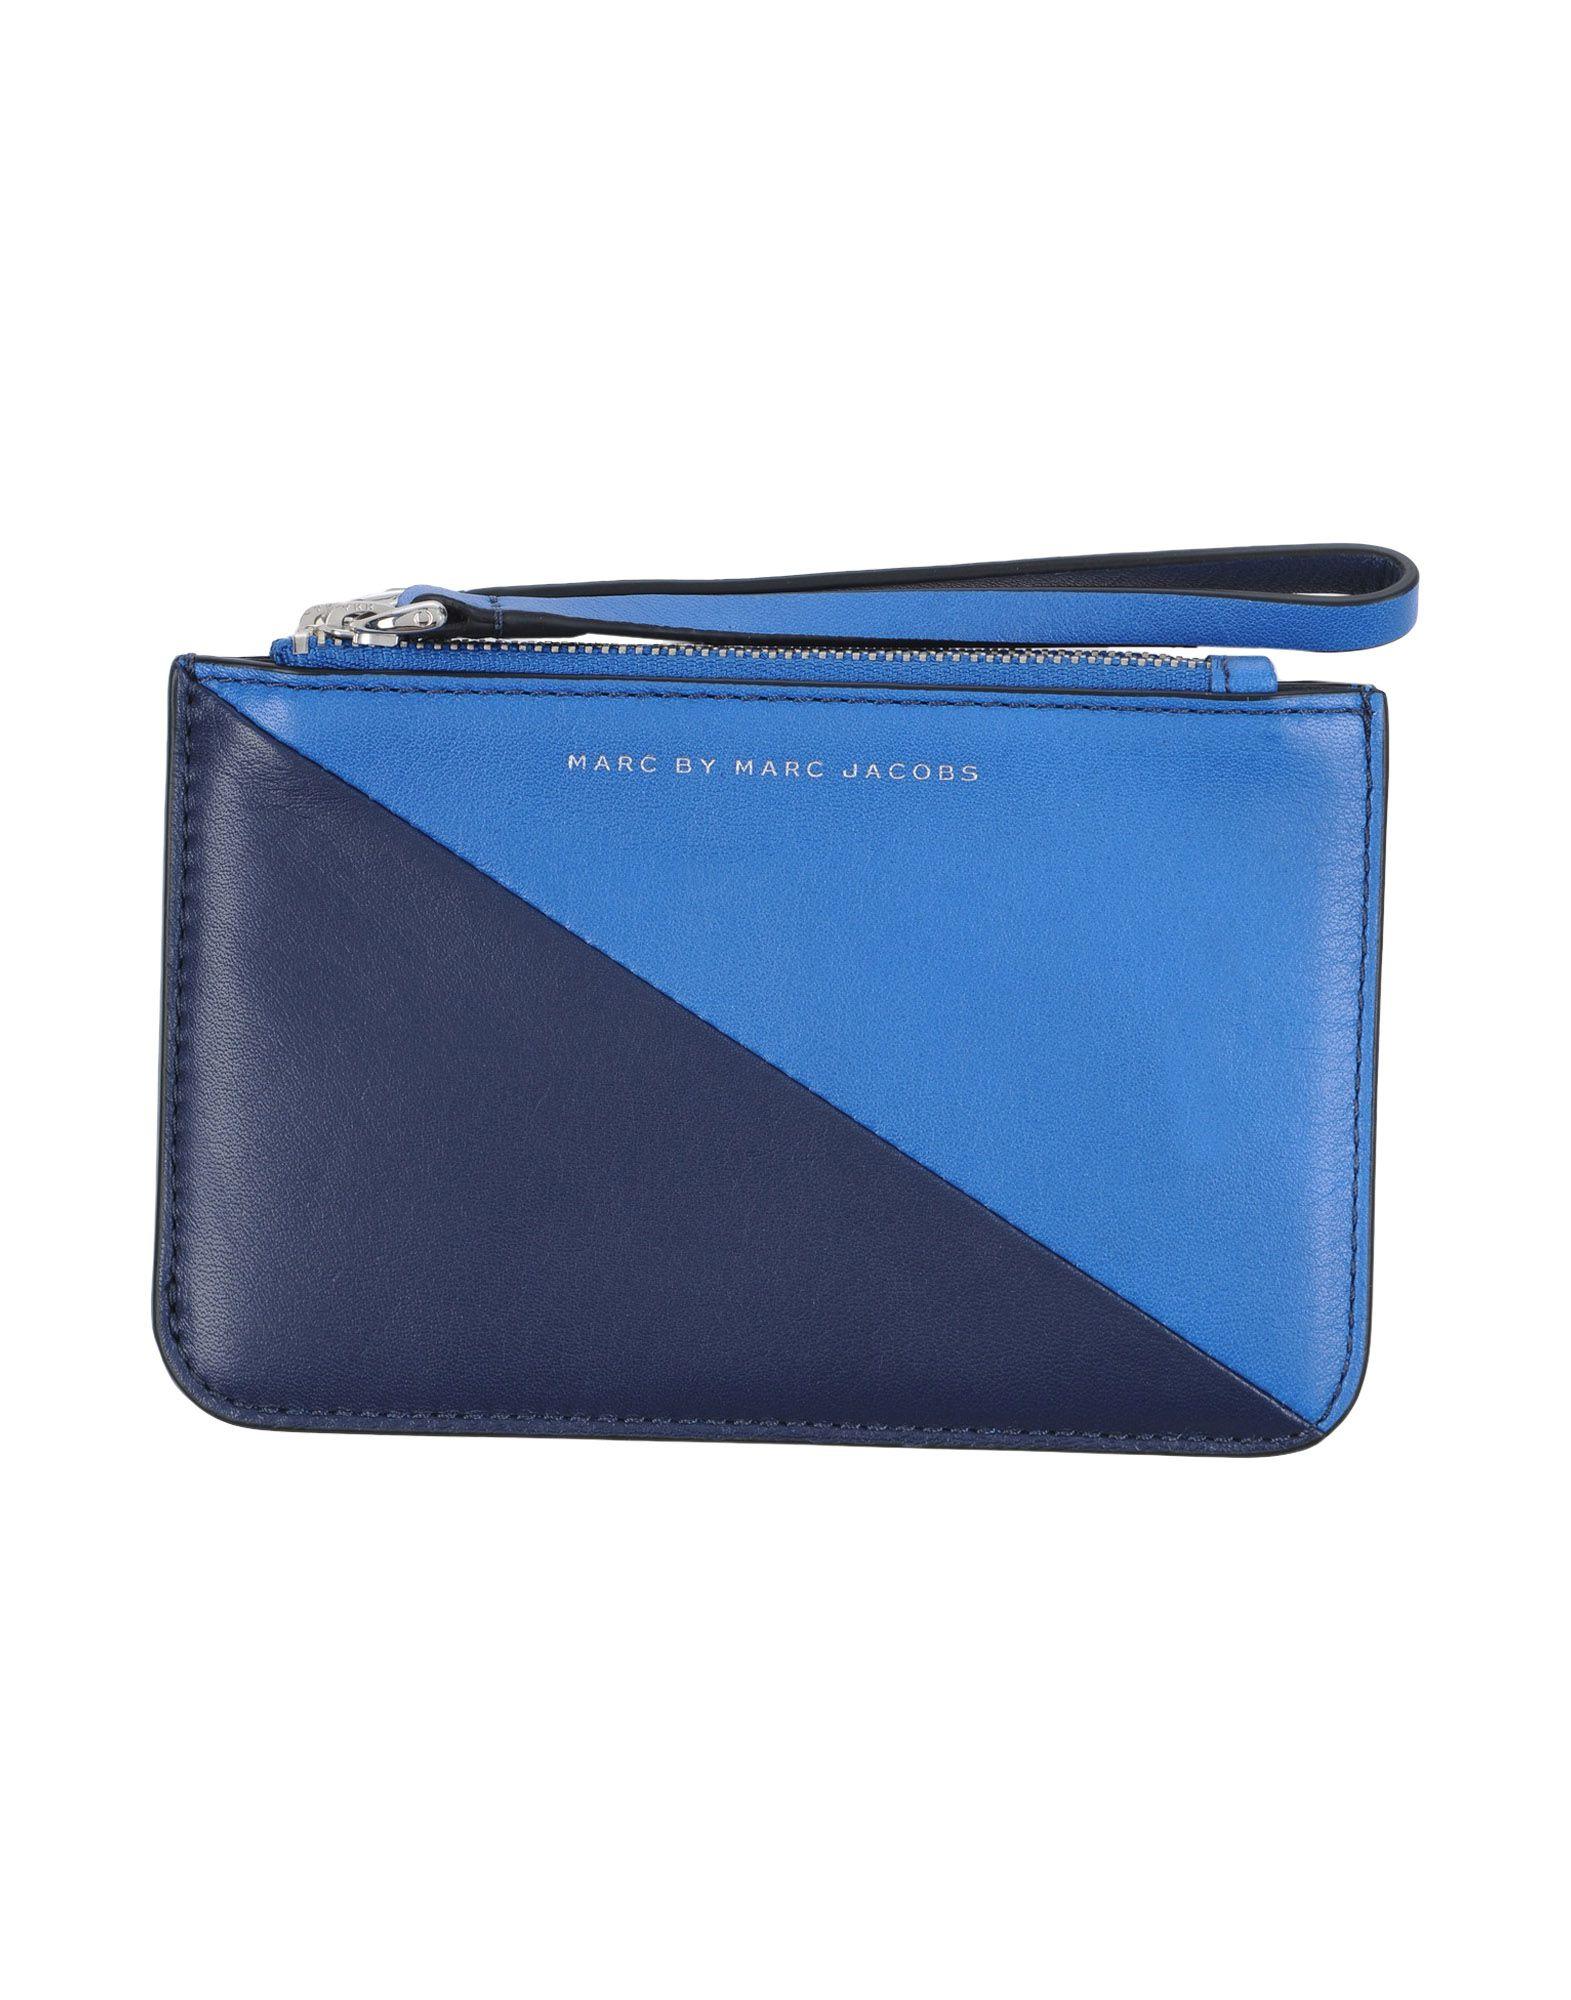 MARC BY MARC JACOBS Damen Portemonnaie Farbe Blau Größe 1